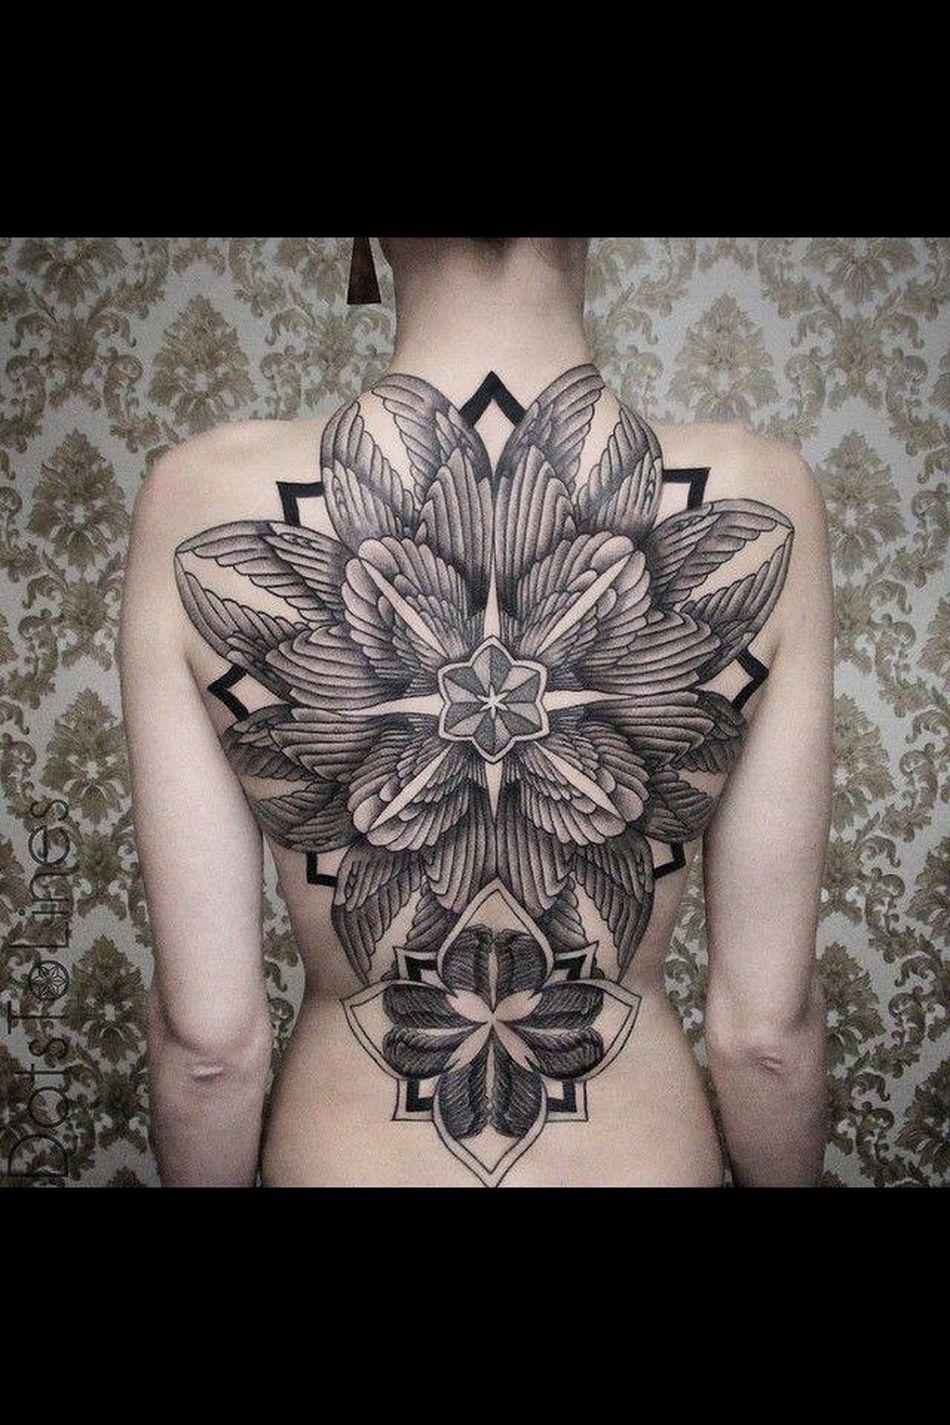 Flowers Tattooed Bodyart Inkedgirls Body And Soul Ink Inked Amazing Stunning Greatwork Lovely